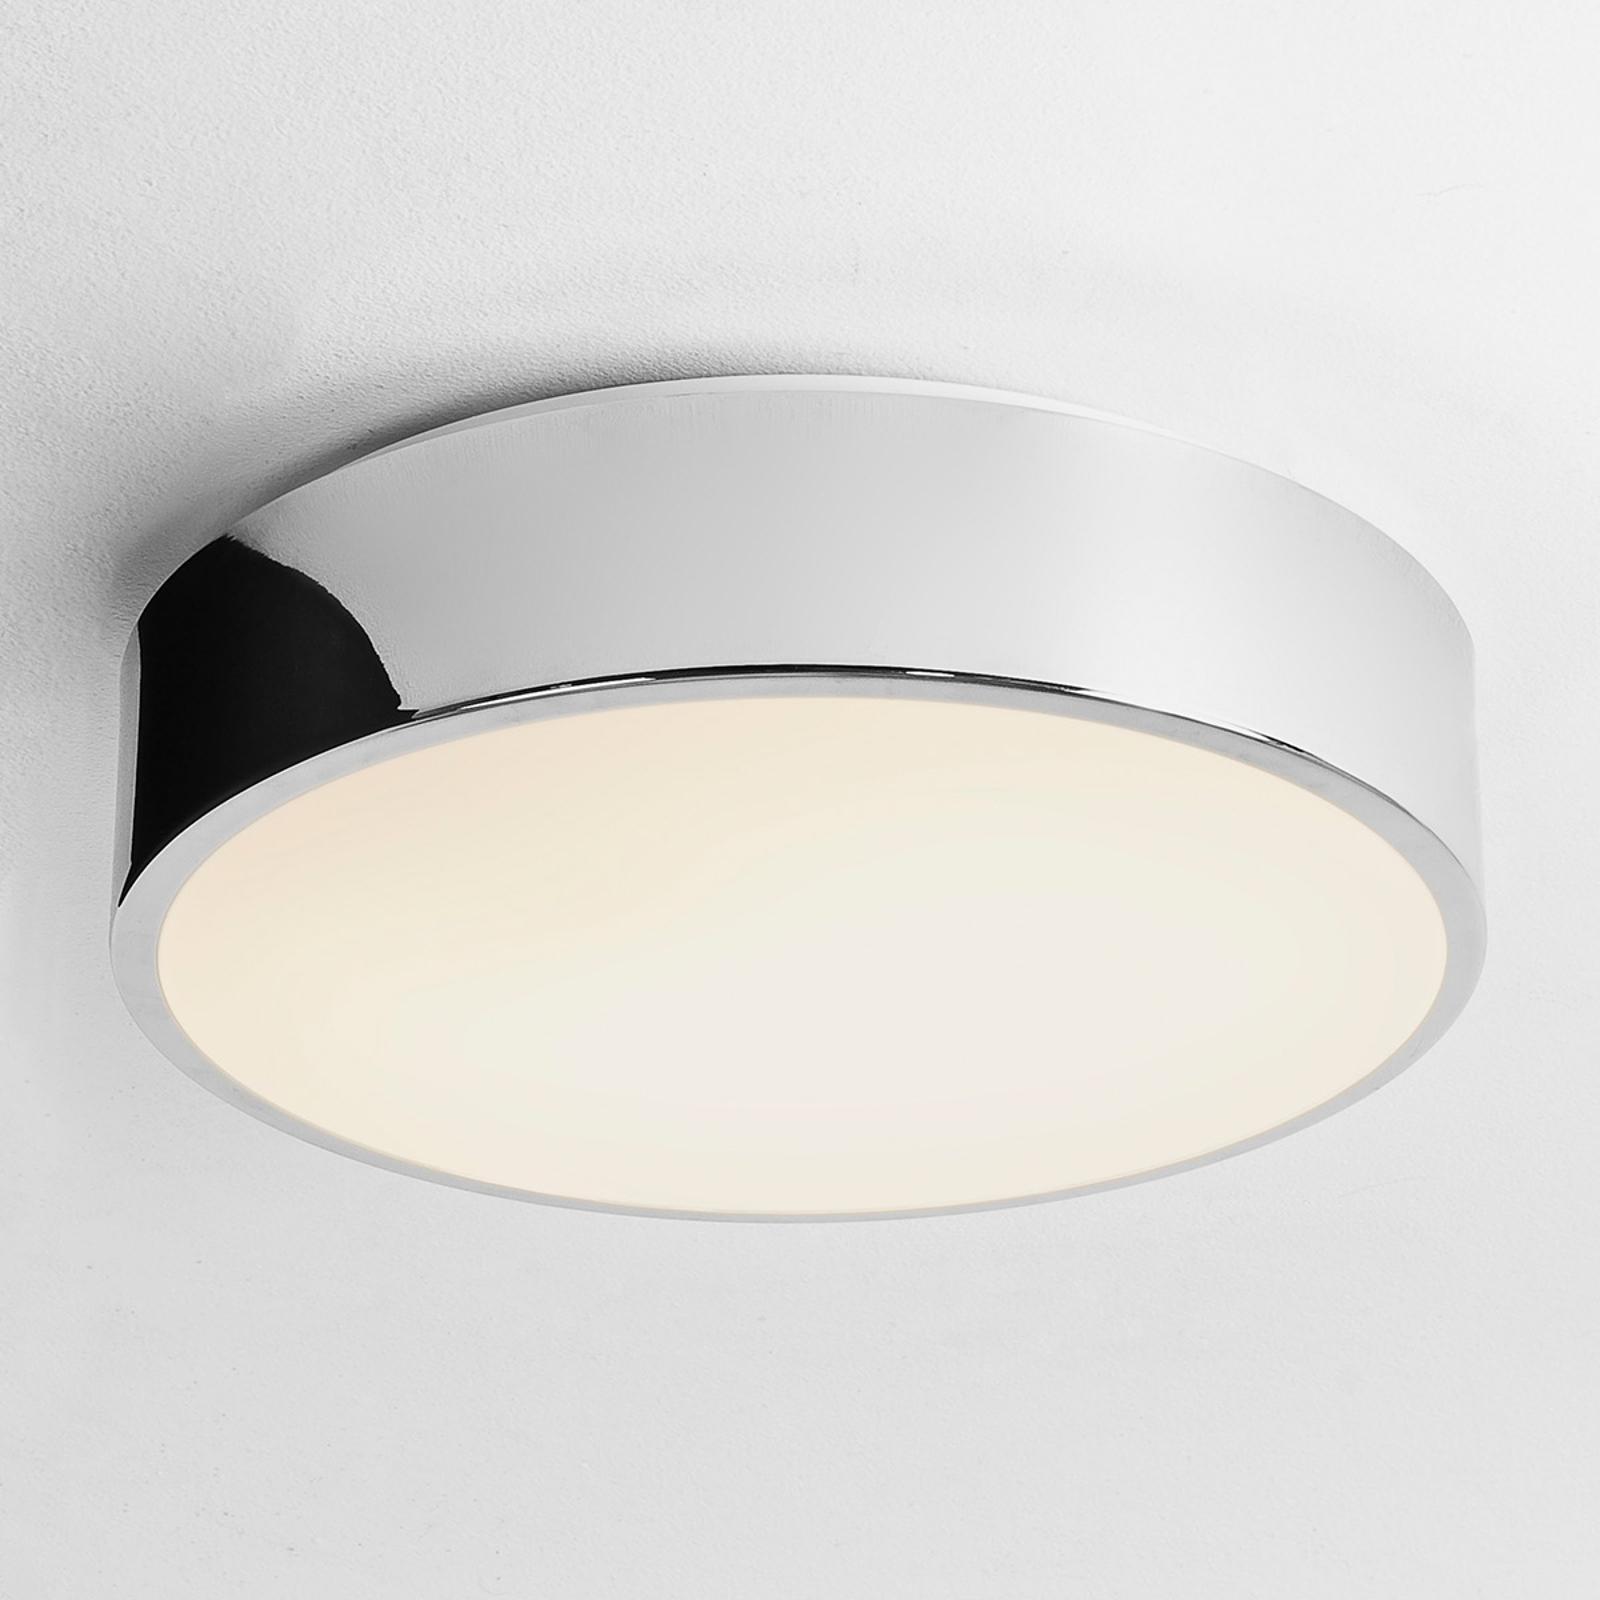 Astro Mallon lampa sufitowa LED Ø 33 cm chrom